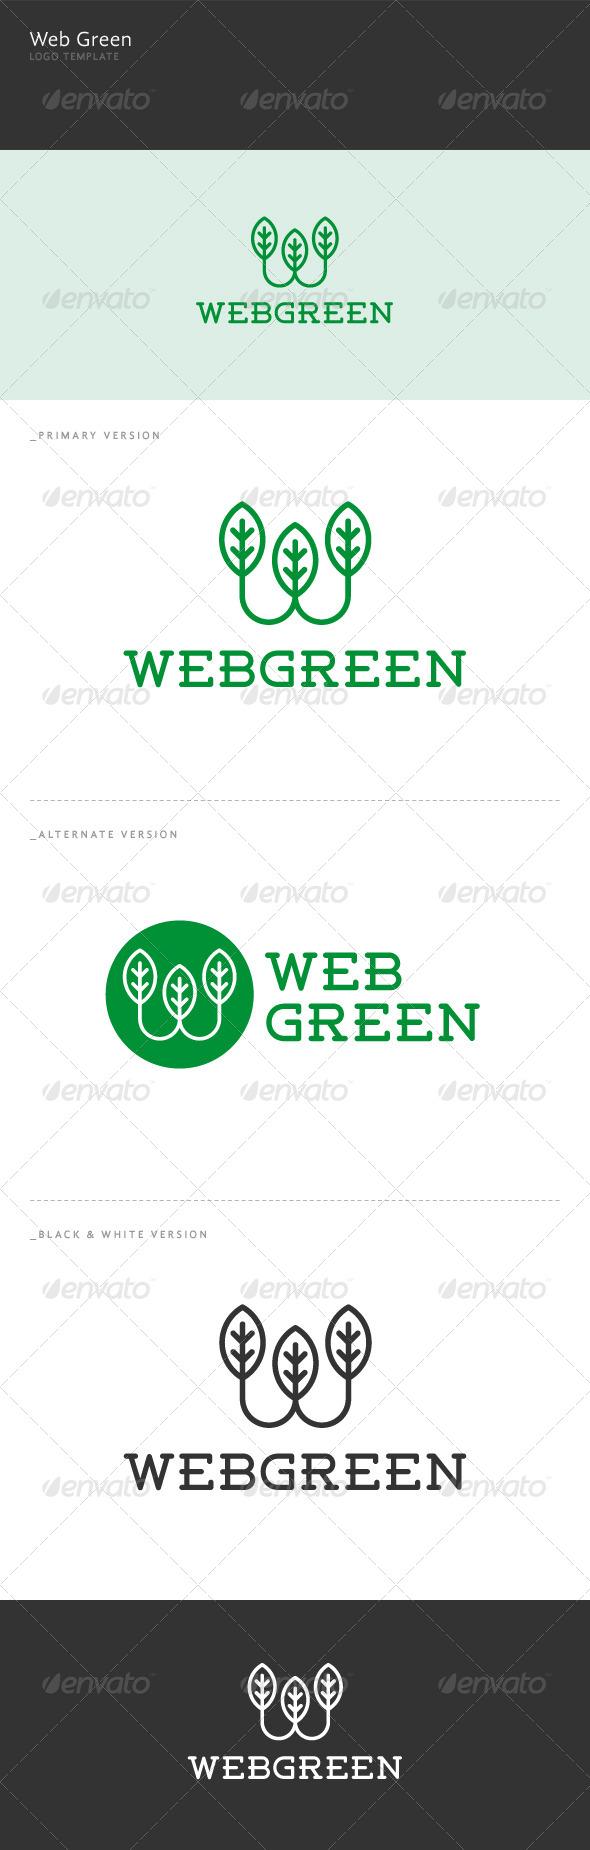 Web Green - W Letter Logo - Letters Logo Templates